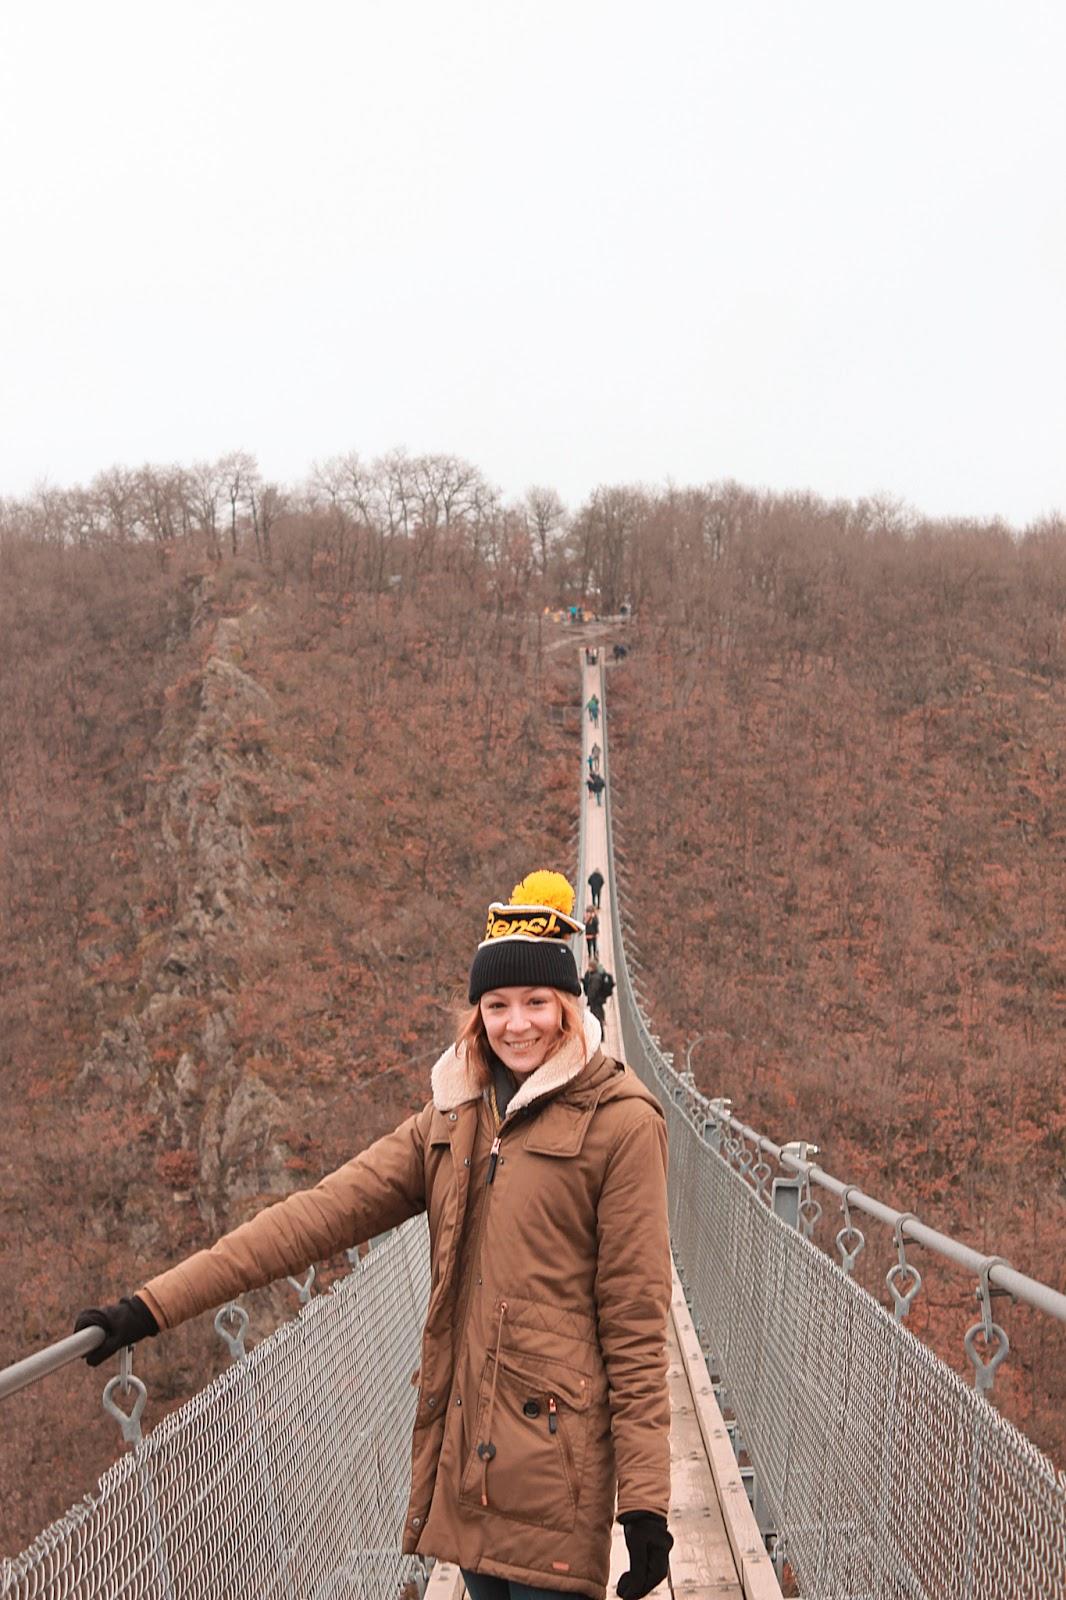 Geierlay-puente-colgante-largo-Alemania